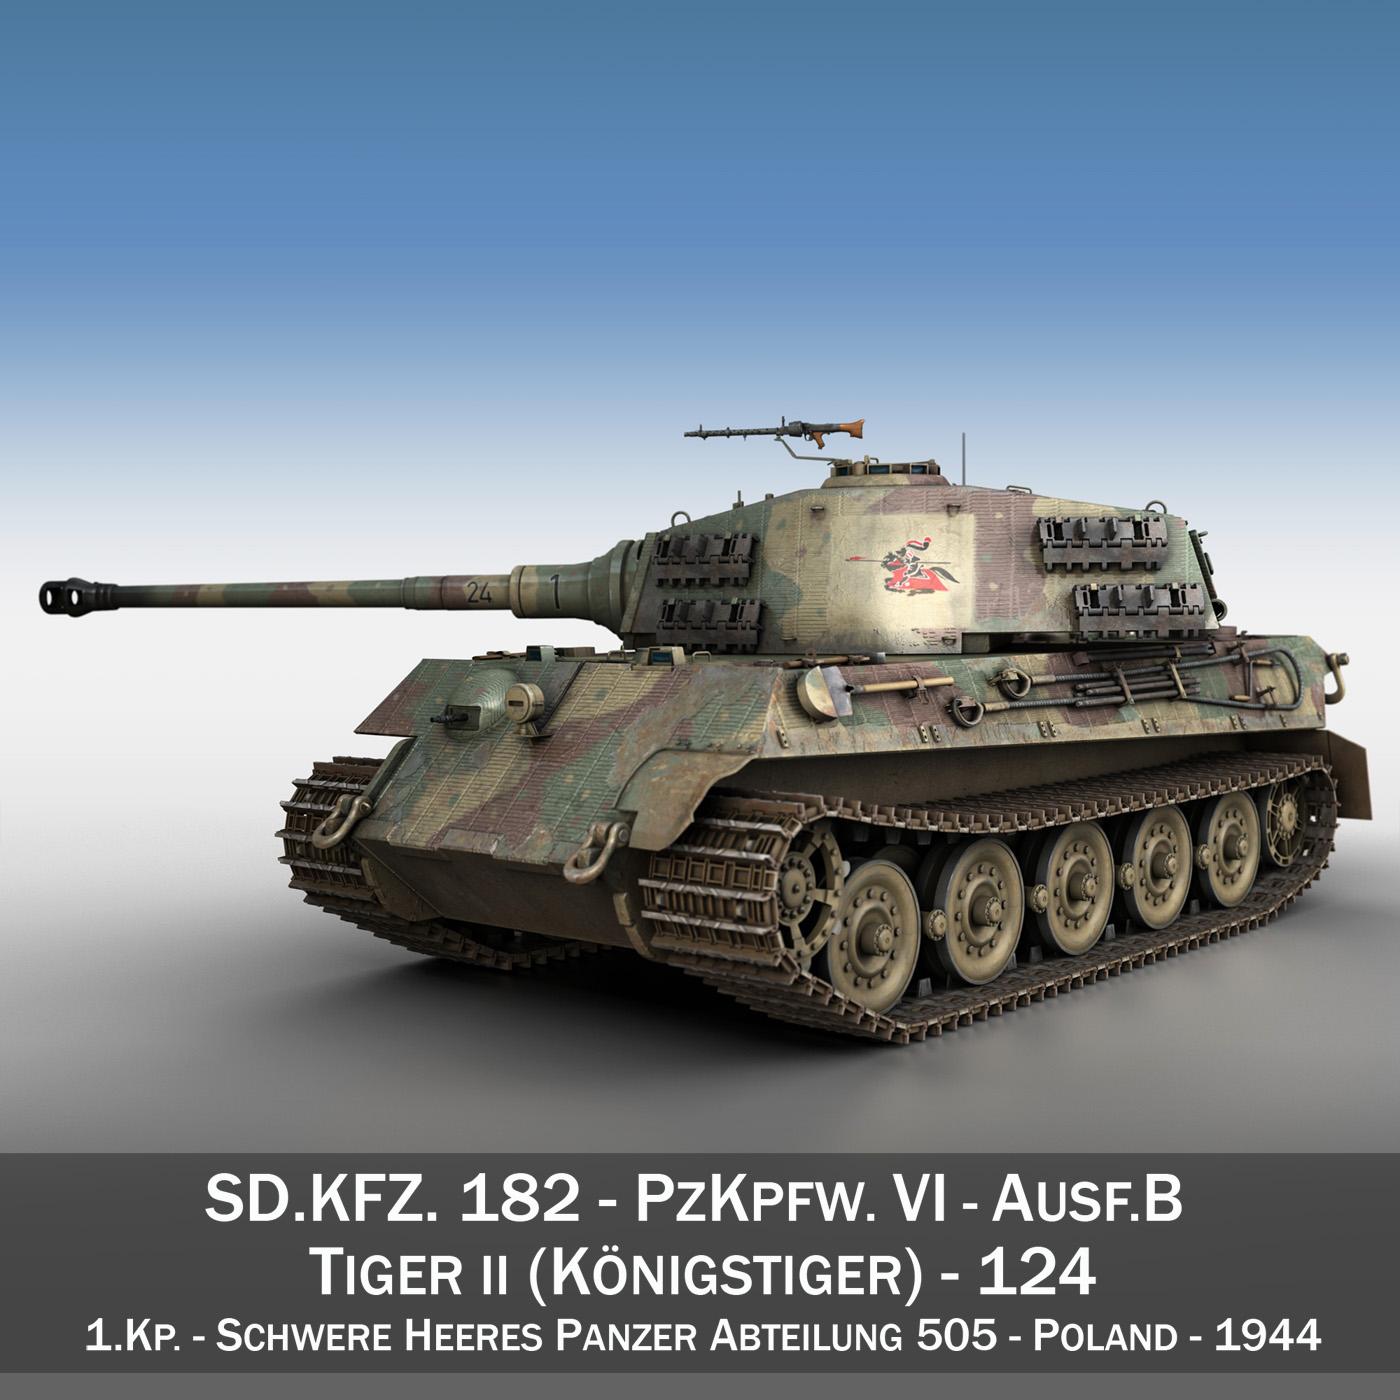 Panzerkampfwagen VI - Ausf B - Tiger II - 124 3d model 3ds c4d lwo lws lw obj 273754